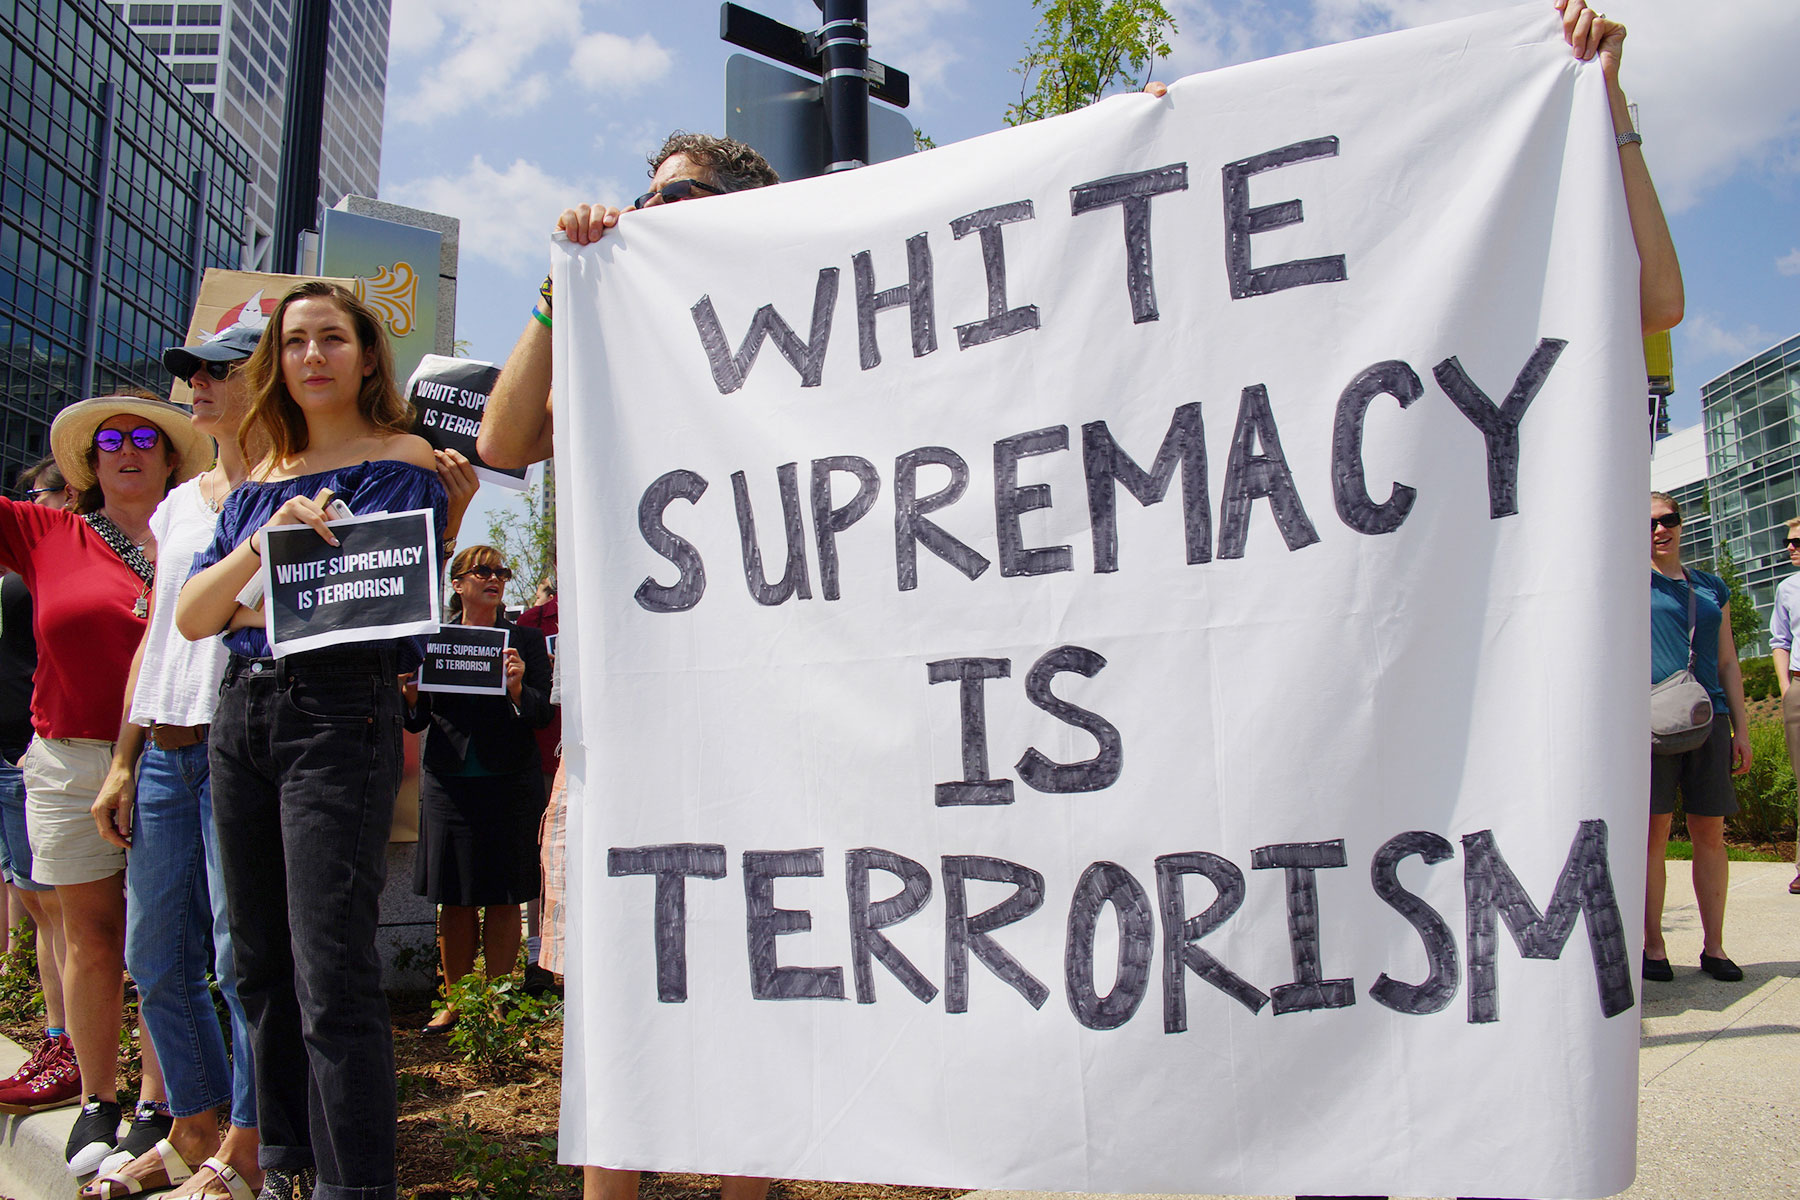 081917_whitepowerprotest_0716